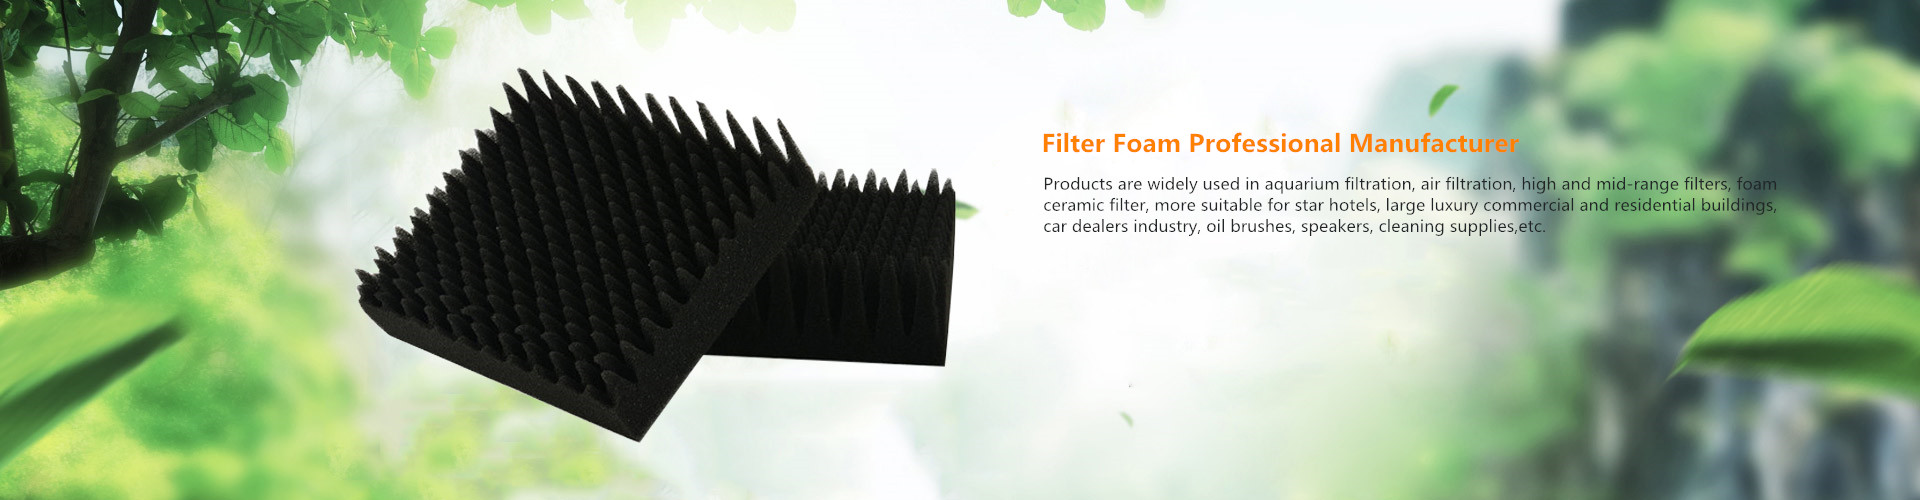 filter foam professional manufacturer